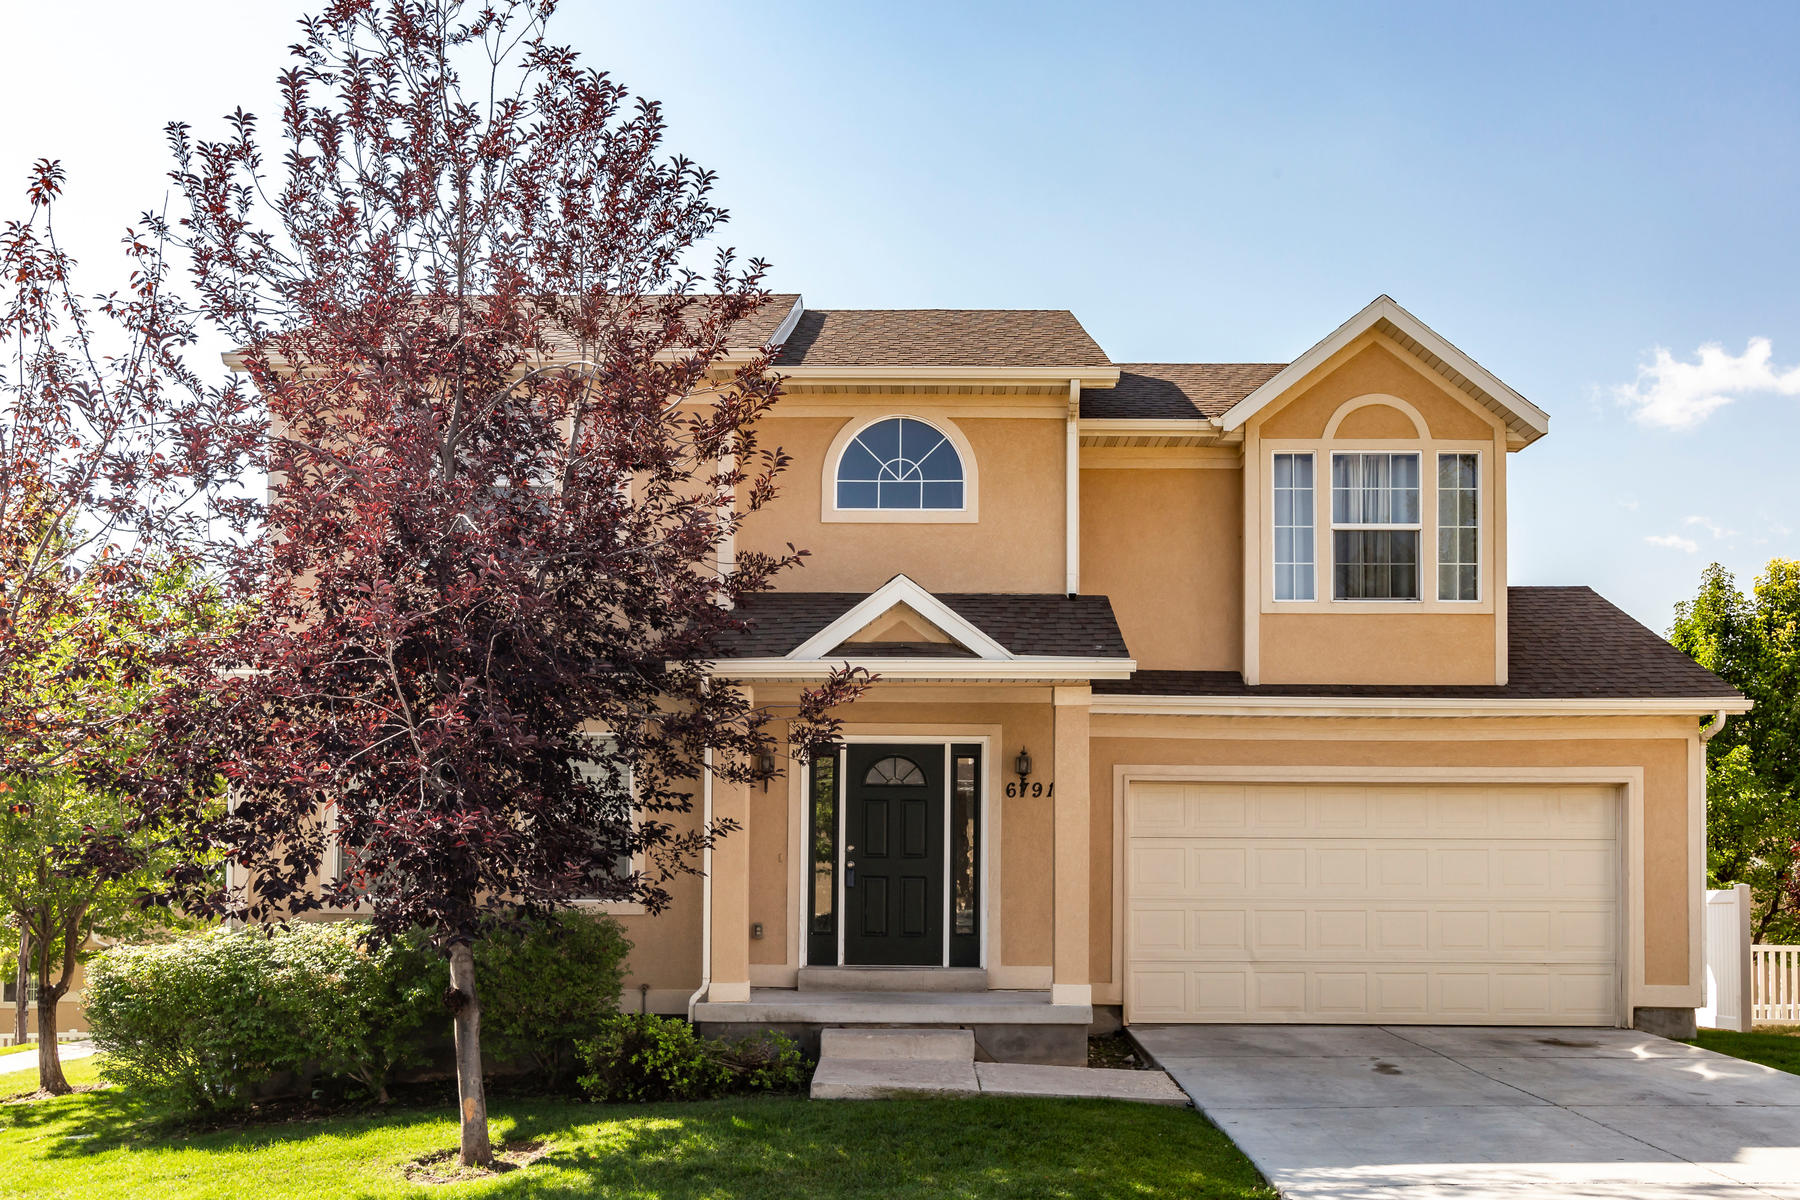 Single Family Homes vì Bán tại Single Family Home With Community Amenities 6791Grevillea Ln, West Jordan, Utah 84088 Hoa Kỳ